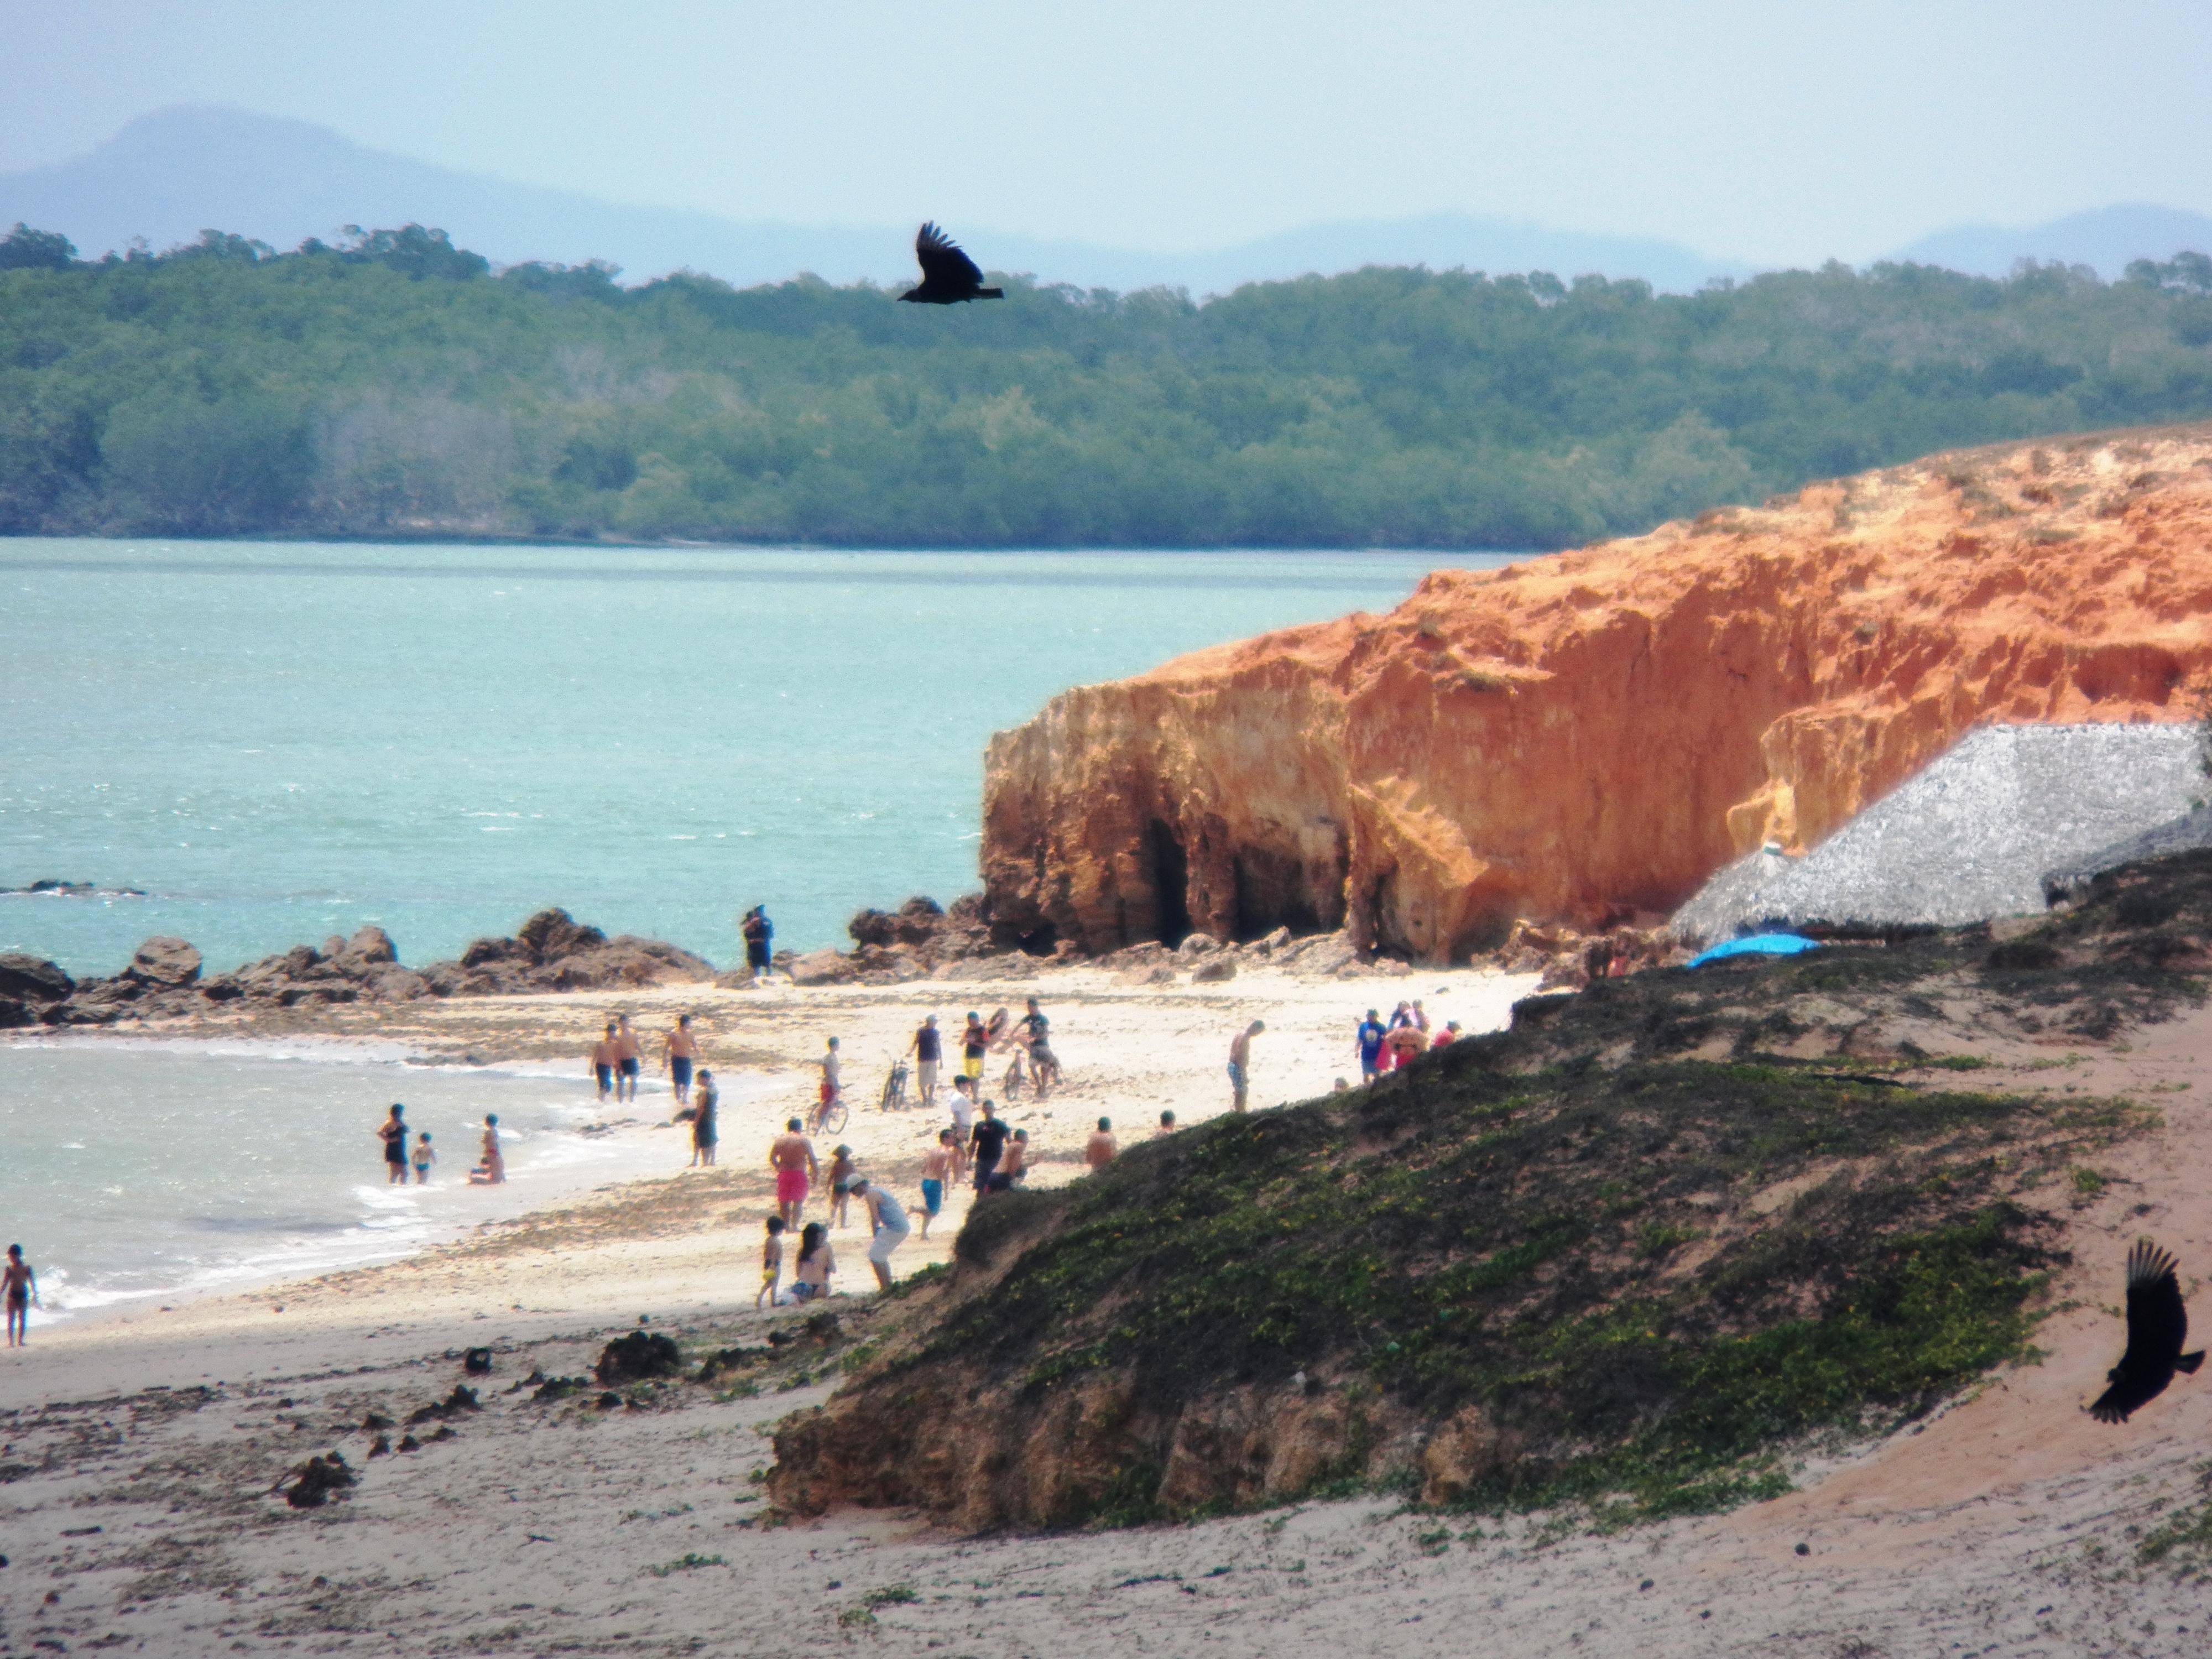 Camocim Ceará fonte: upload.wikimedia.org